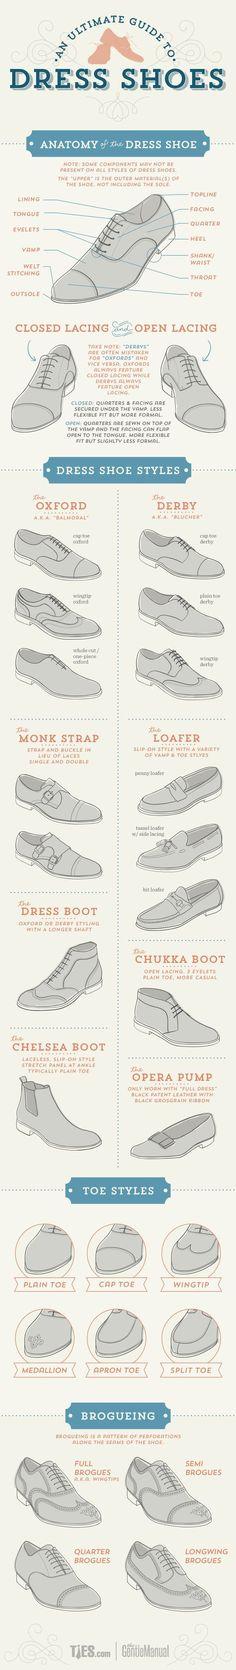 Shoe Dictionary. Closed and open lacing. Oxford, Derby, monk strap, loafer, dress boot, chukka boot, Chelsea boot, opera bump, plain toe, apron toe, split toe, full brogues, semi-brogues, quarter brogue, longwing brogue.